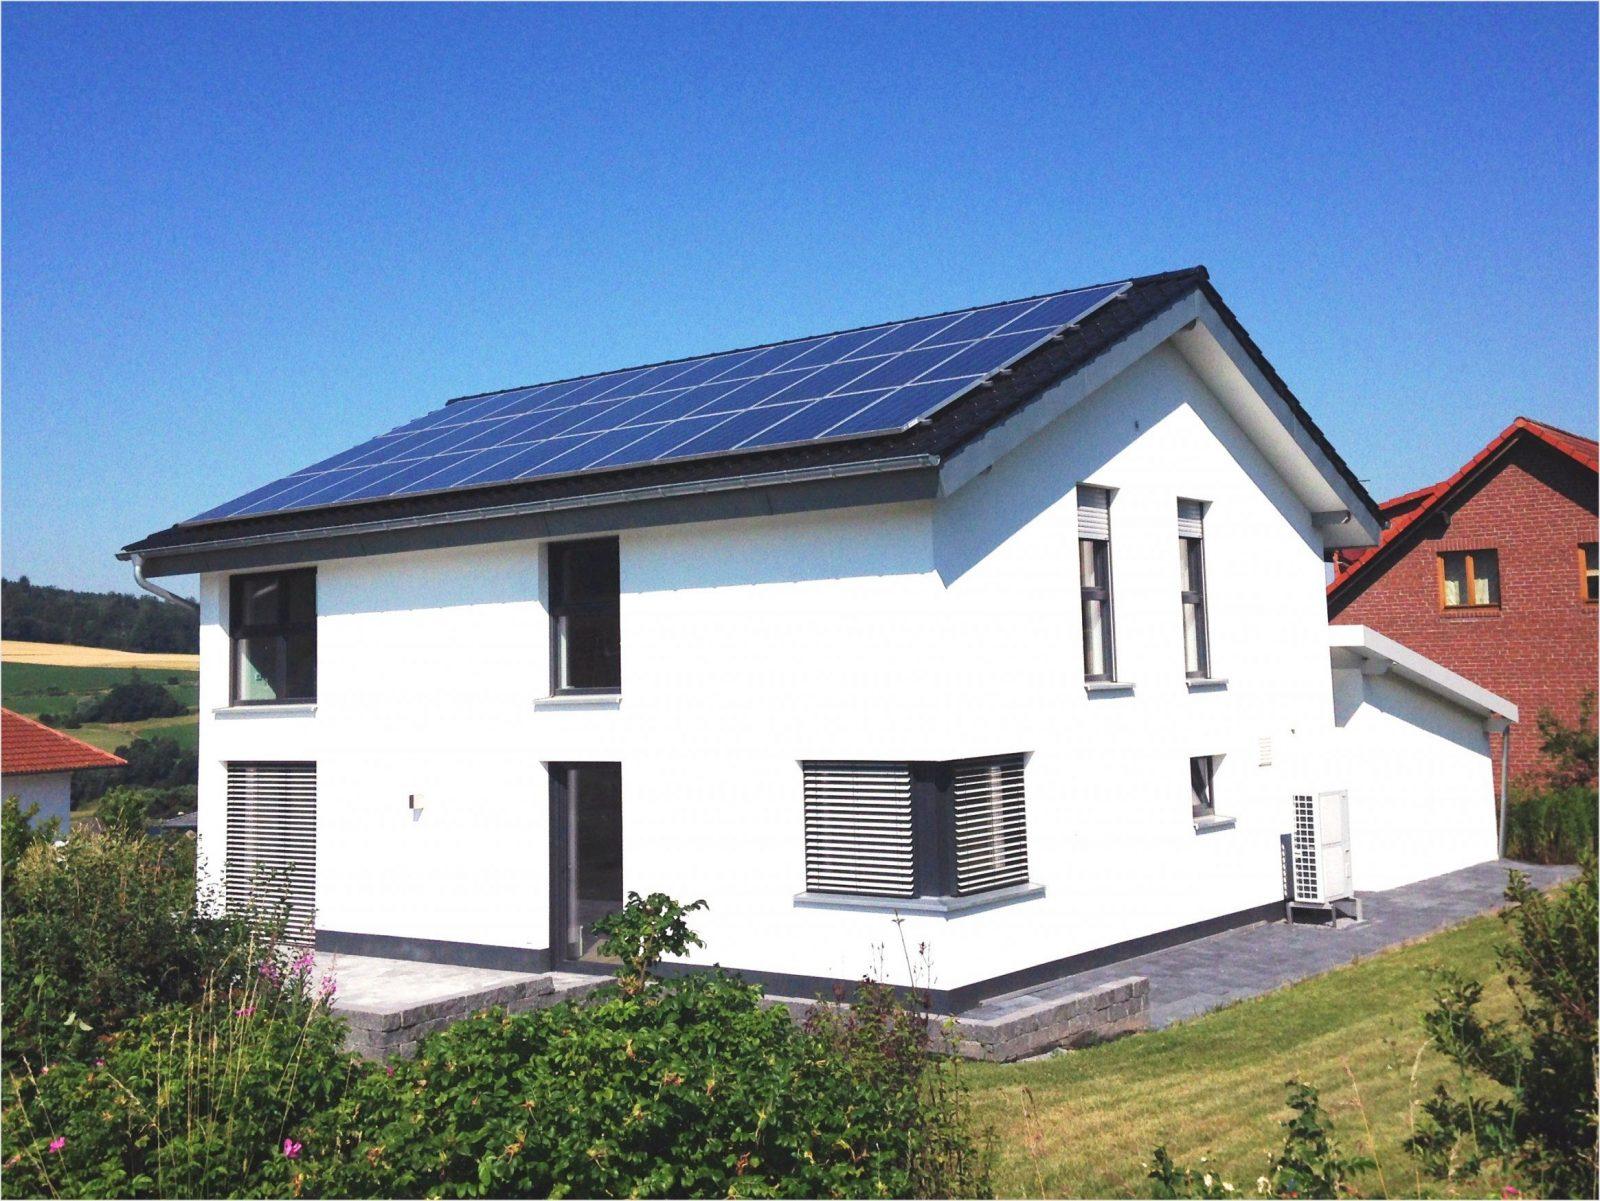 Flachdachhaus Kosten Fertighaus Bauen Preise Hauser Anbieter Im